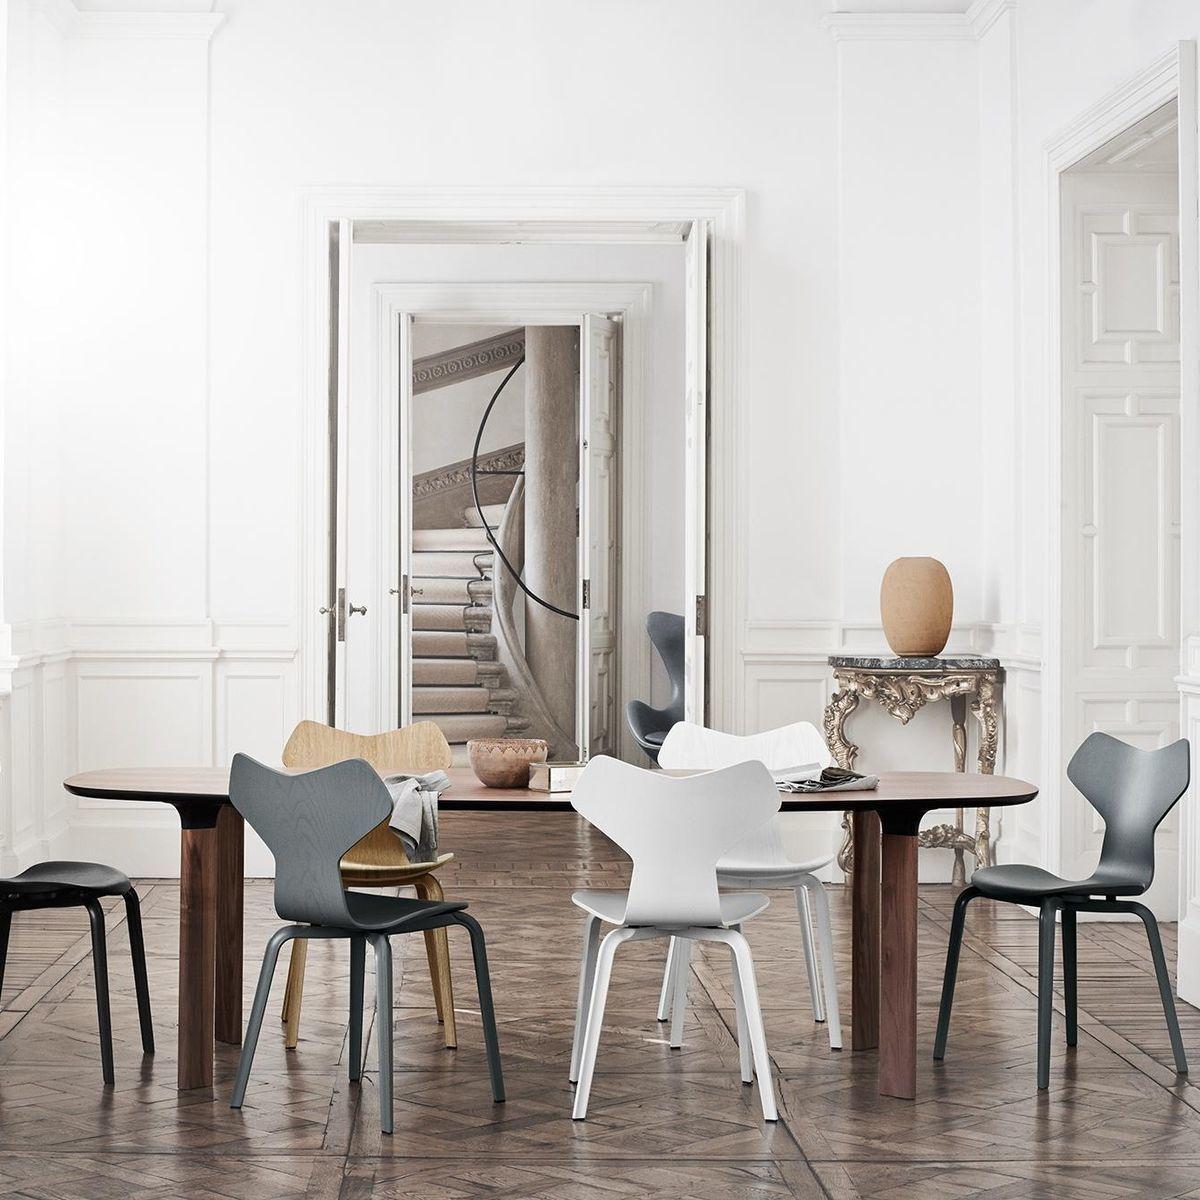 analog dining table 245x105cm fritz hansen. Black Bedroom Furniture Sets. Home Design Ideas